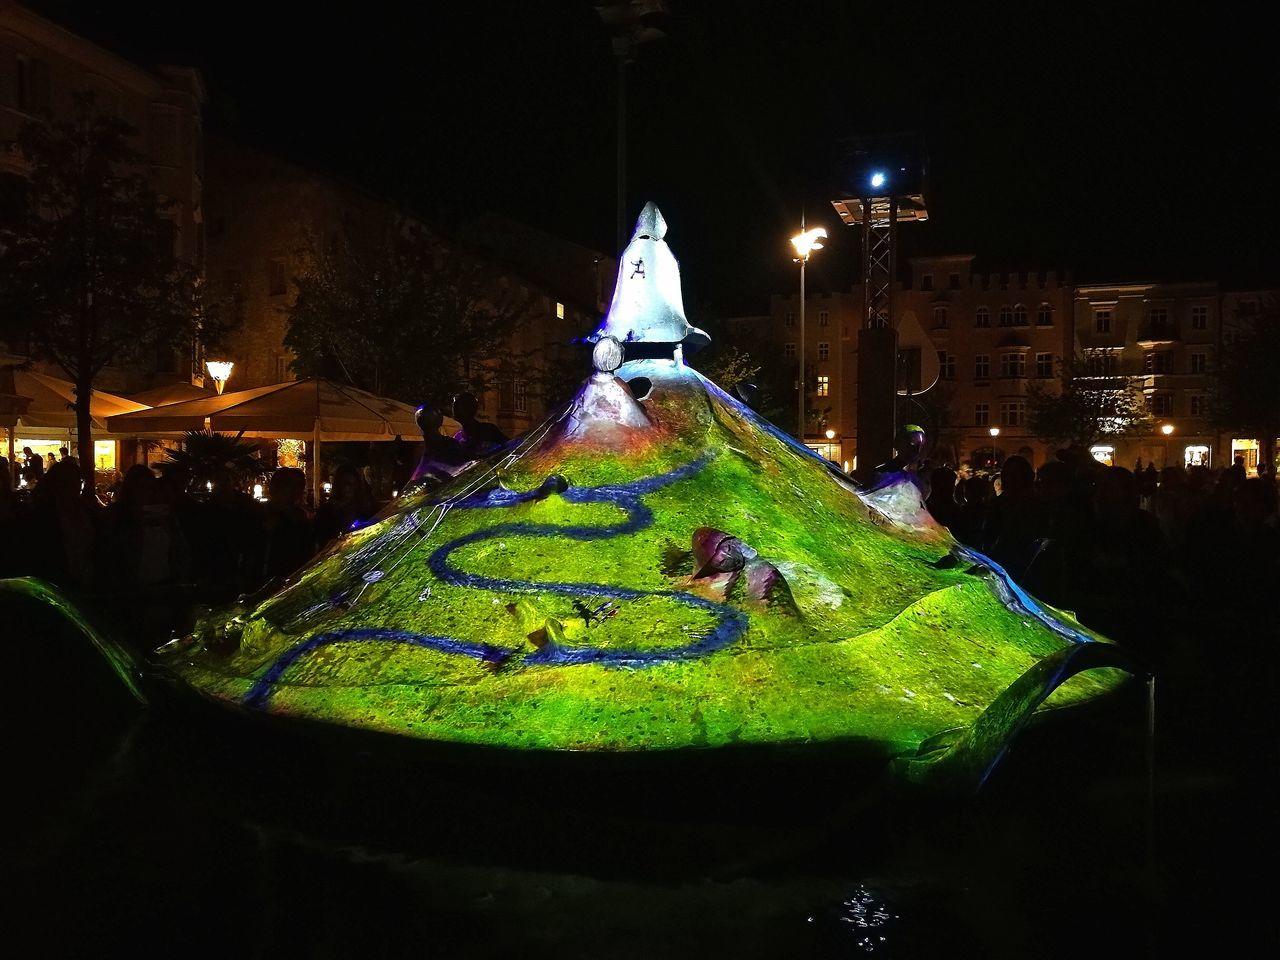 Coloured fountain in the mainsquare Night Illuminated Fountain Alto Adige Italy🇮🇹 Bressanone Isarco No People Arts Culture And Entertainment Multi Colored Nightlife Tourism